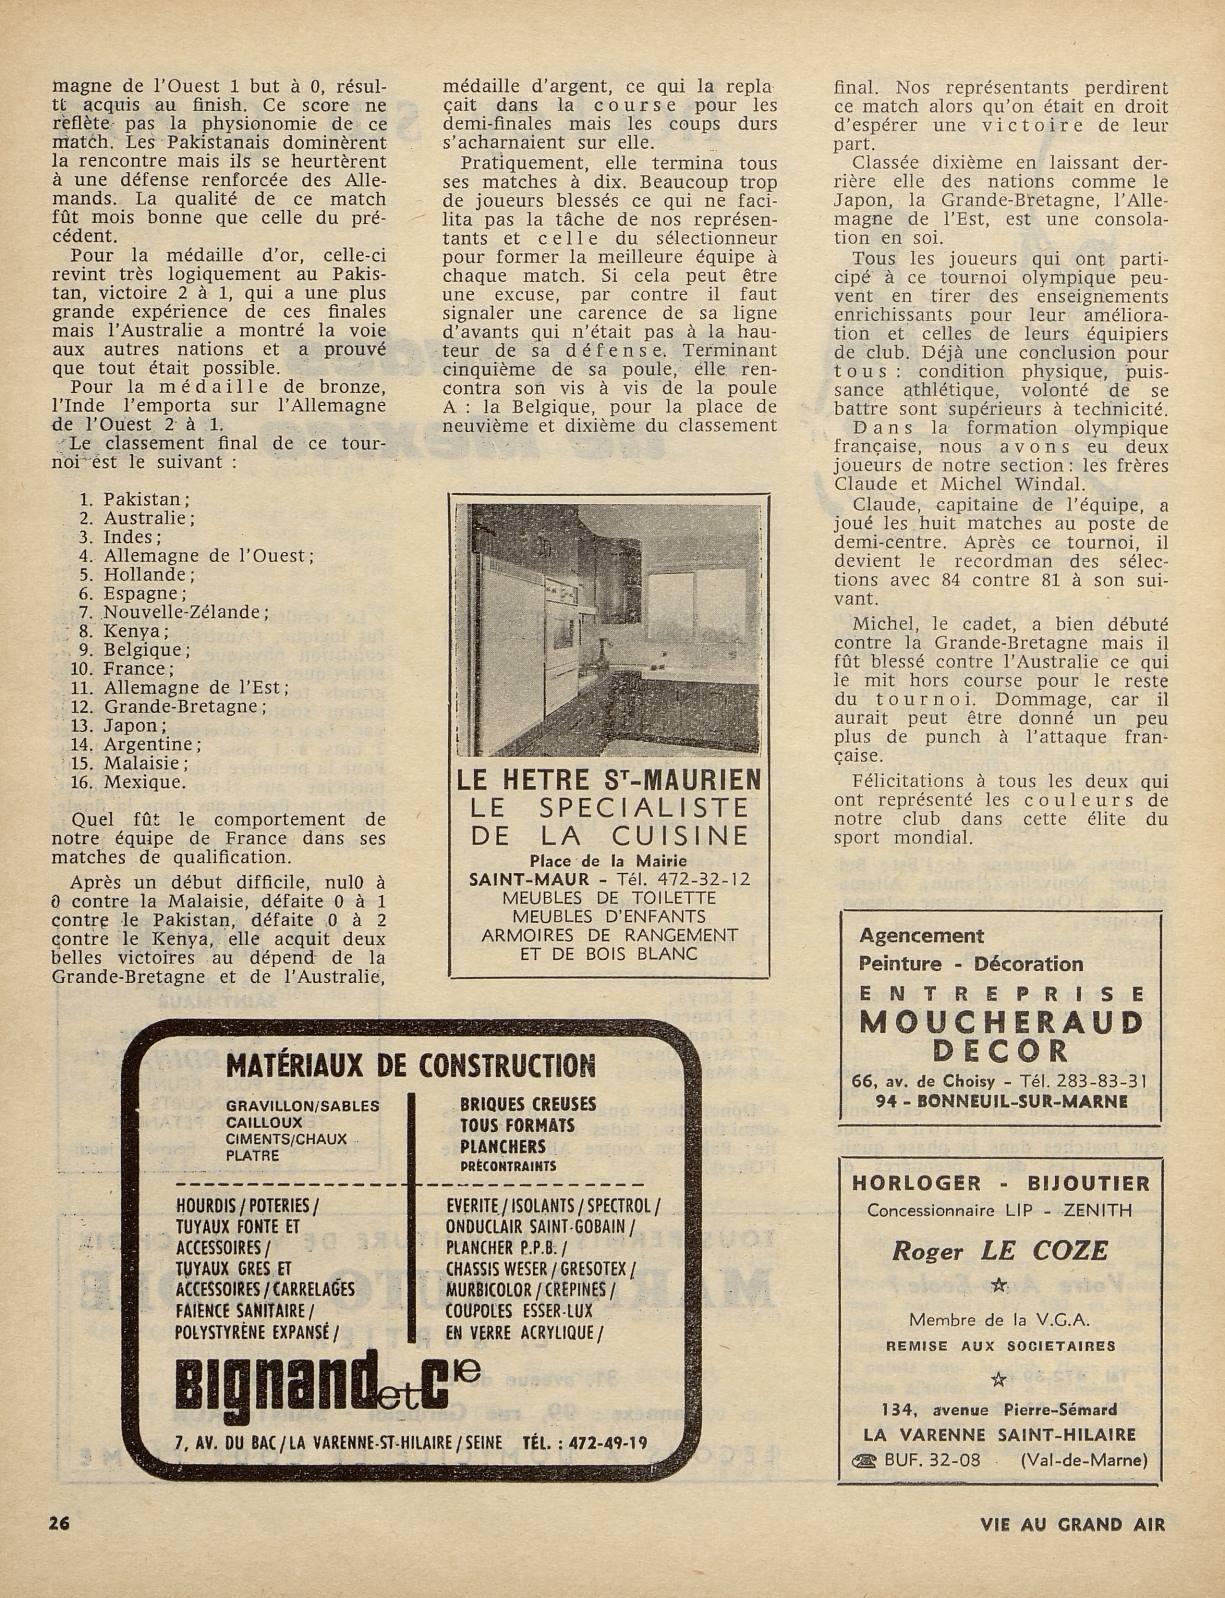 Poesia Brique De Verre 14 nov 06 archives the very best way to 1e434484ff